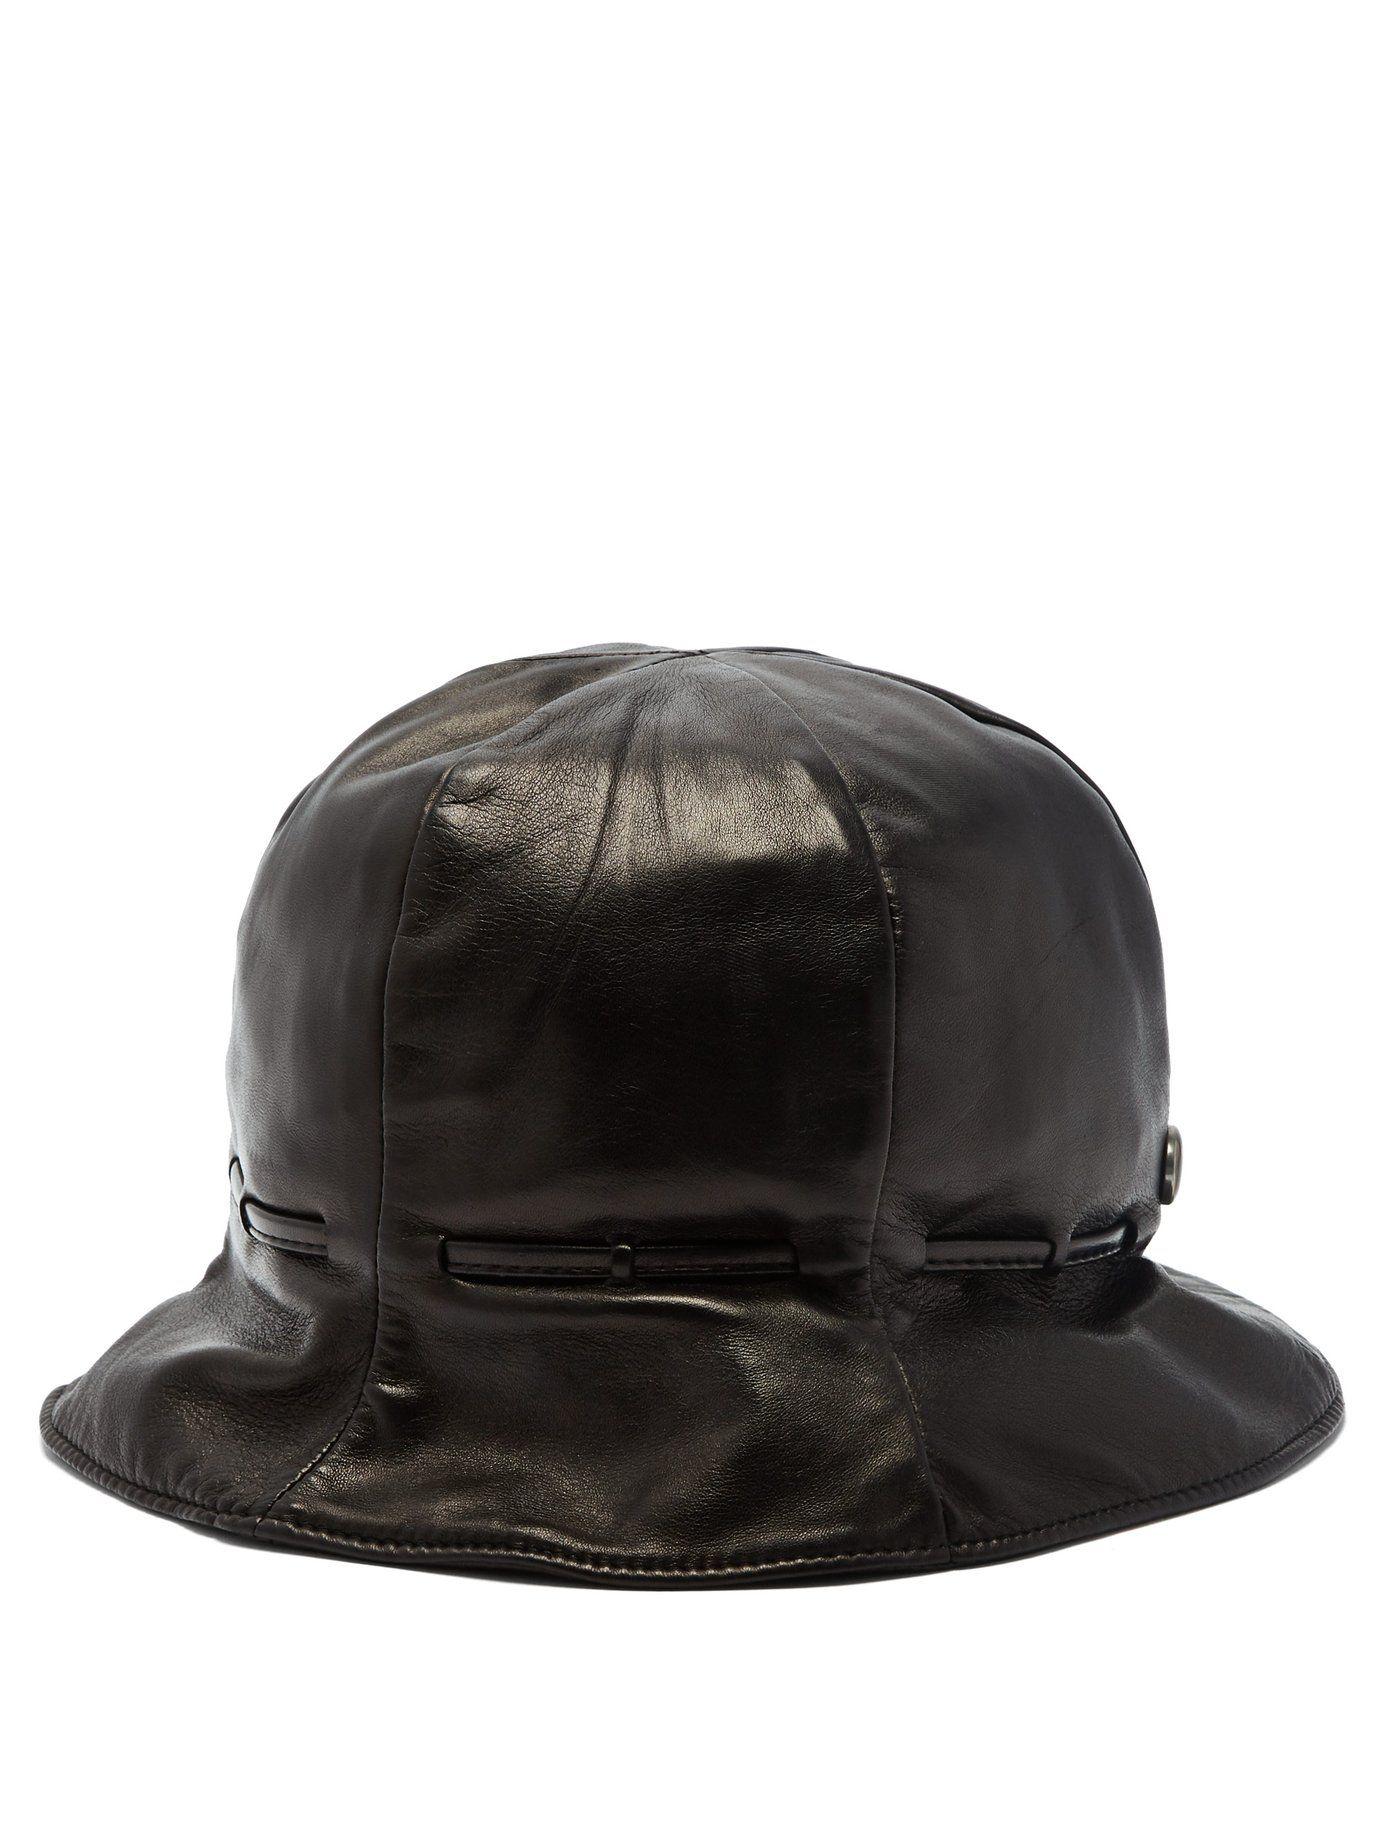 Leather bucket hat  26b63931e05